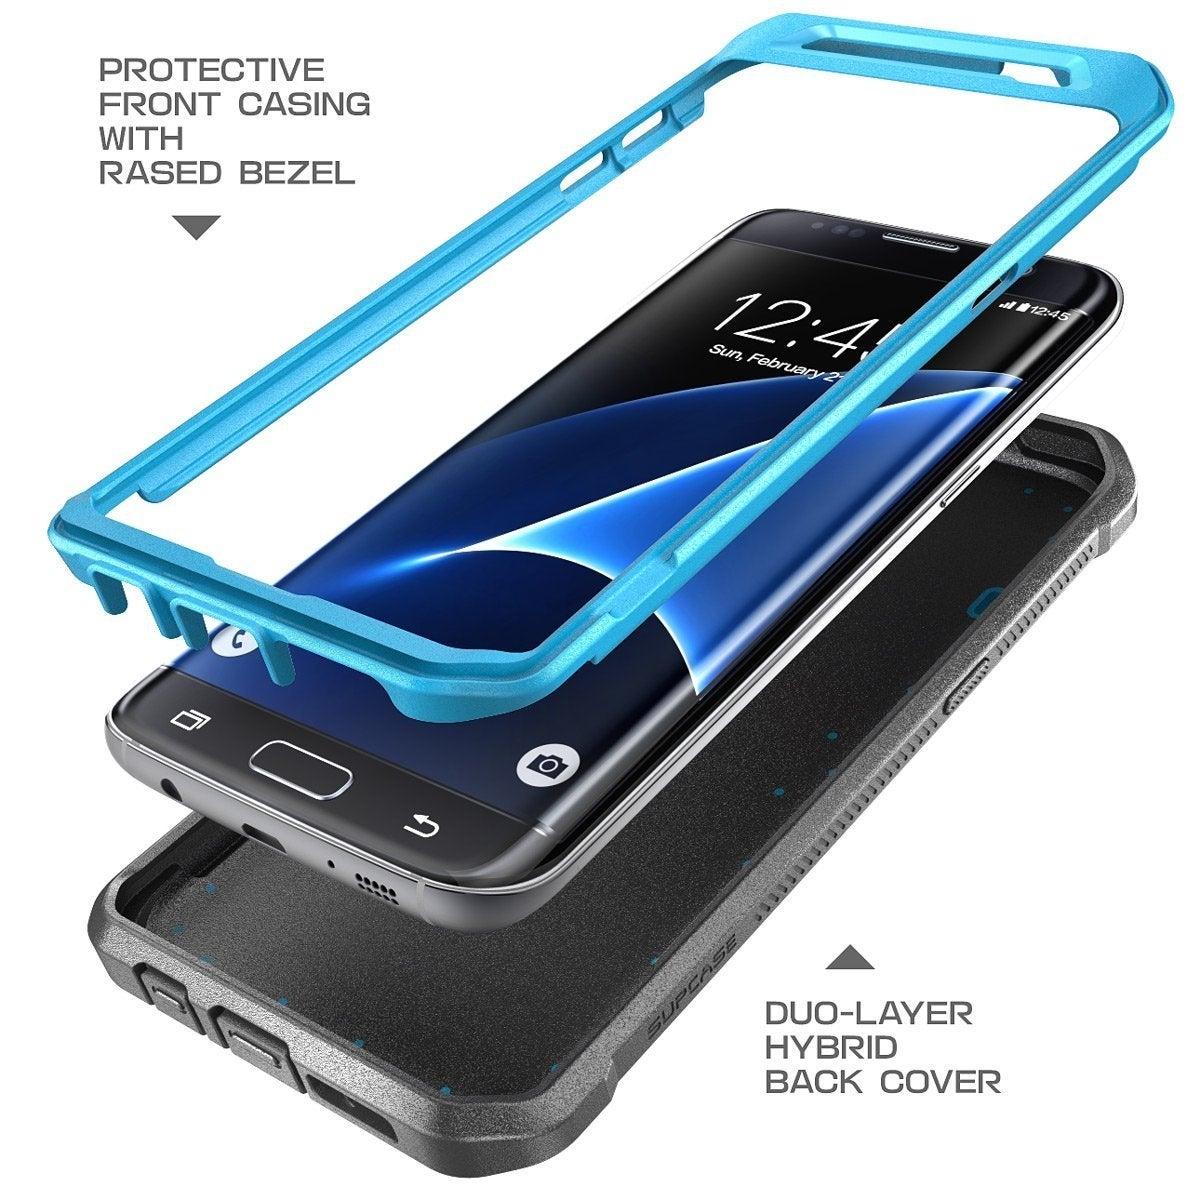 cheap for discount 6e717 196e5 Galaxy S7 Edge Case, SUPCASE,Unicorn Beetle PRO Series, Full-Body Rugged  Holster Case Samsung Galaxy S7 Edge-Blue/Black